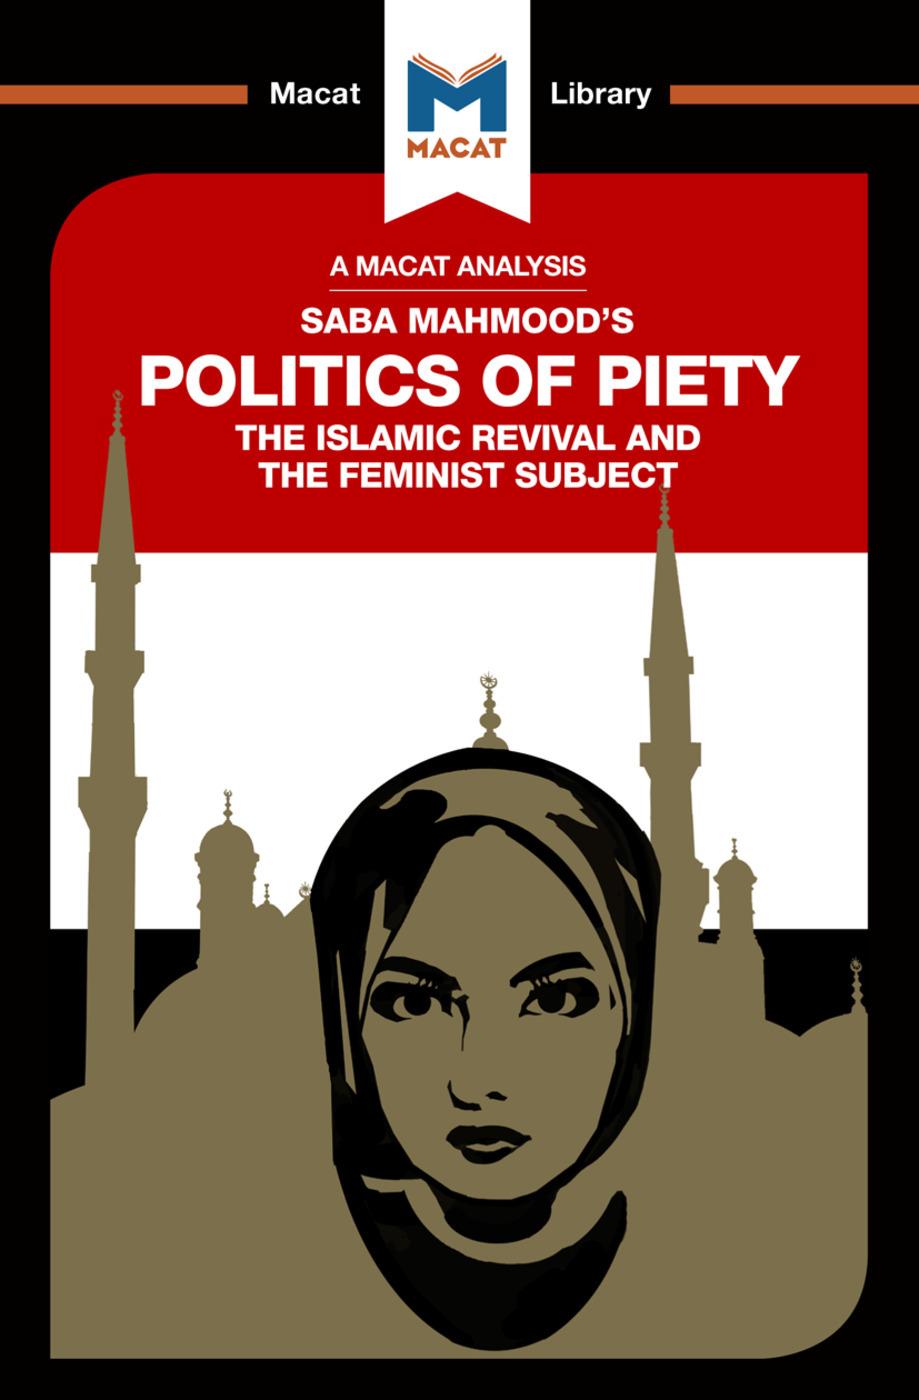 Politics Of Piety The Islamic Revival And The Feminist Subject By Saba Mahmood